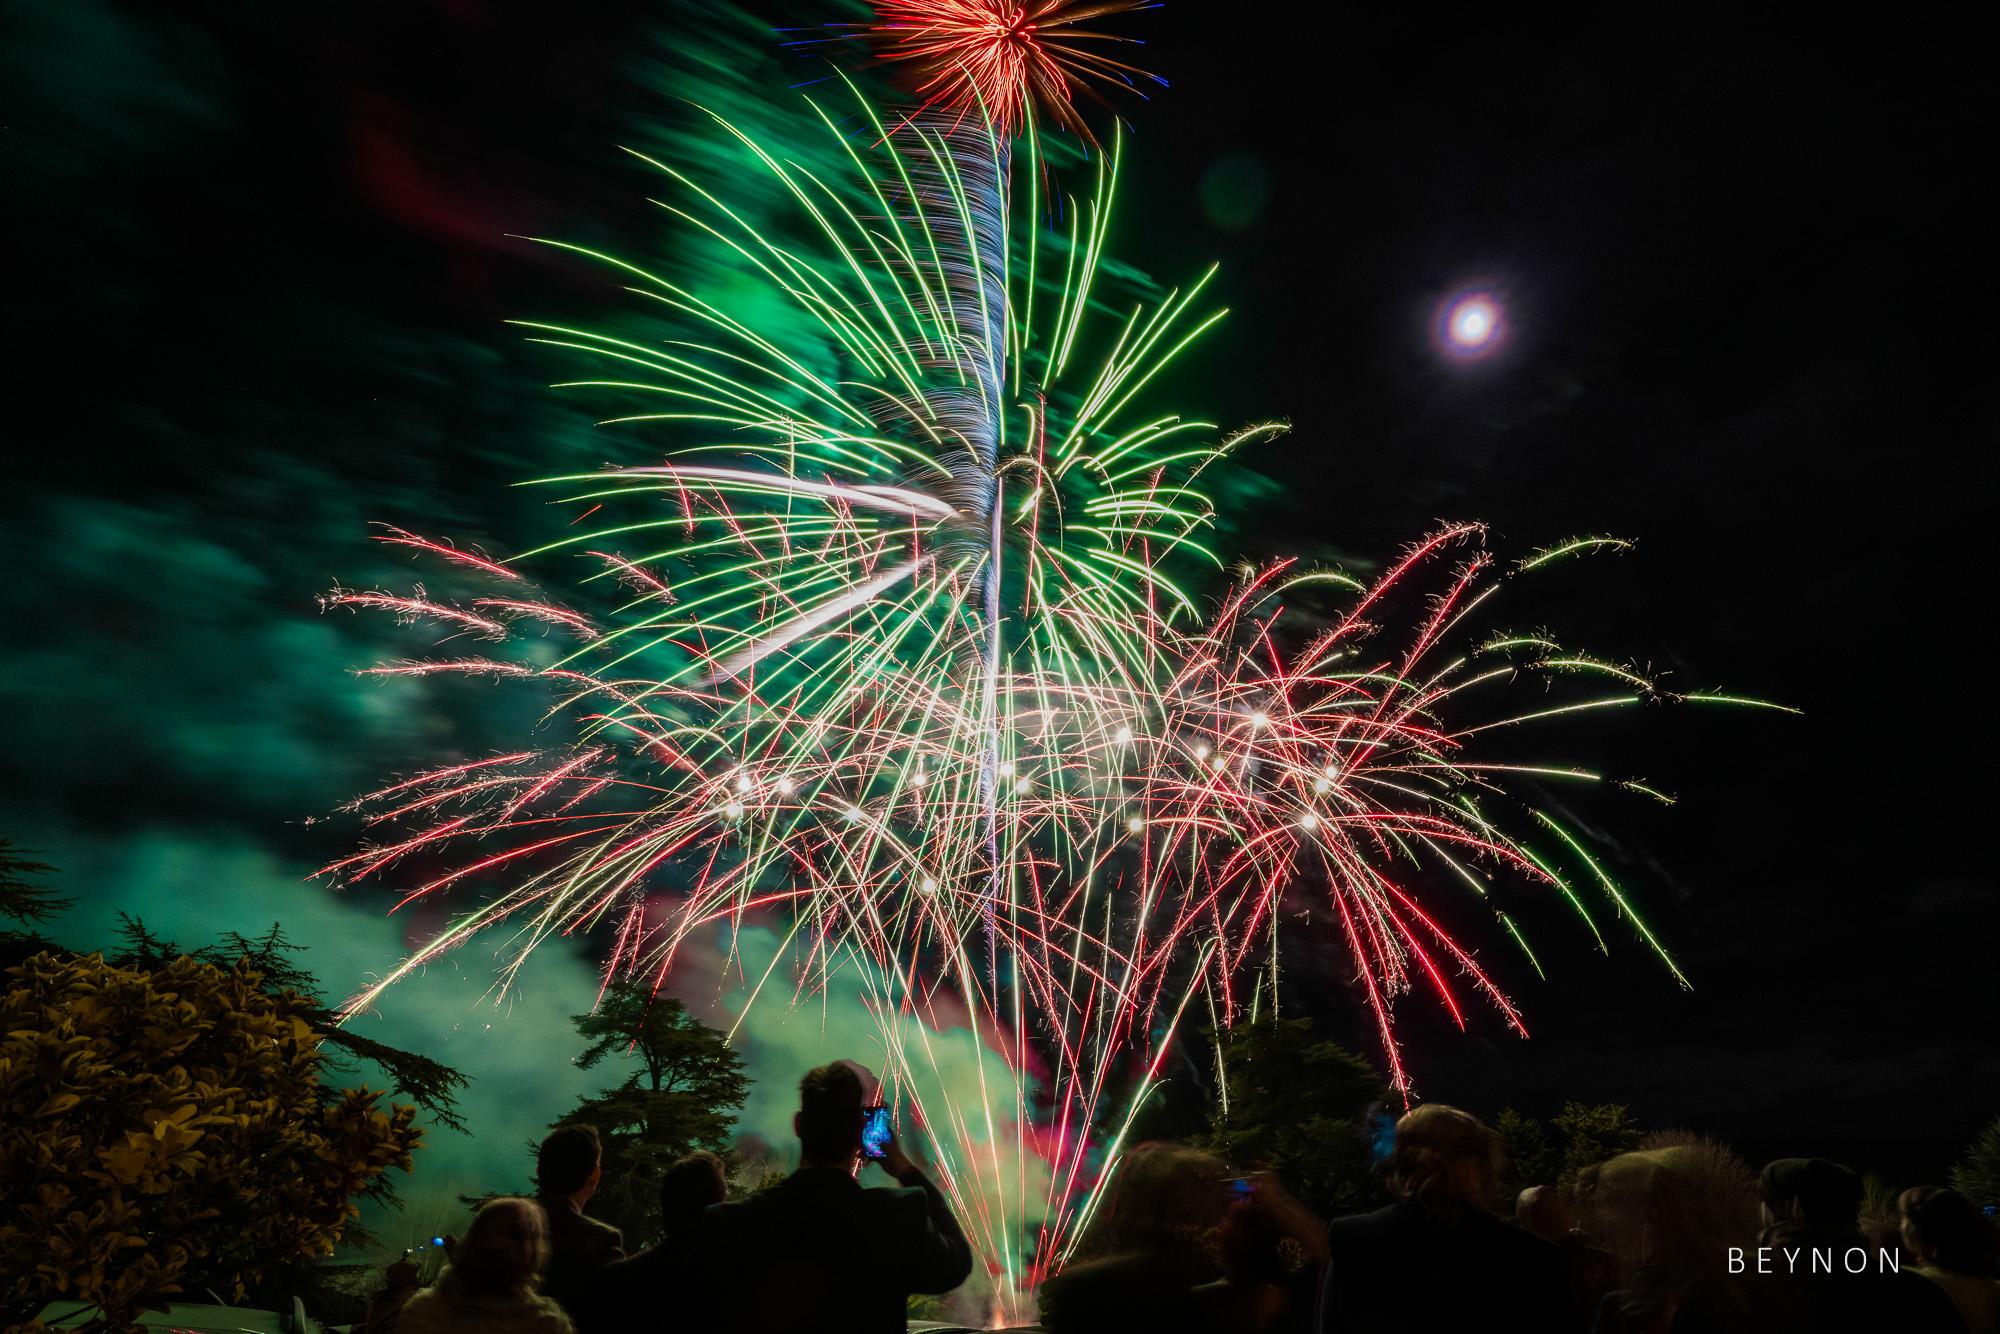 Fireworks at Dumbleton Hall